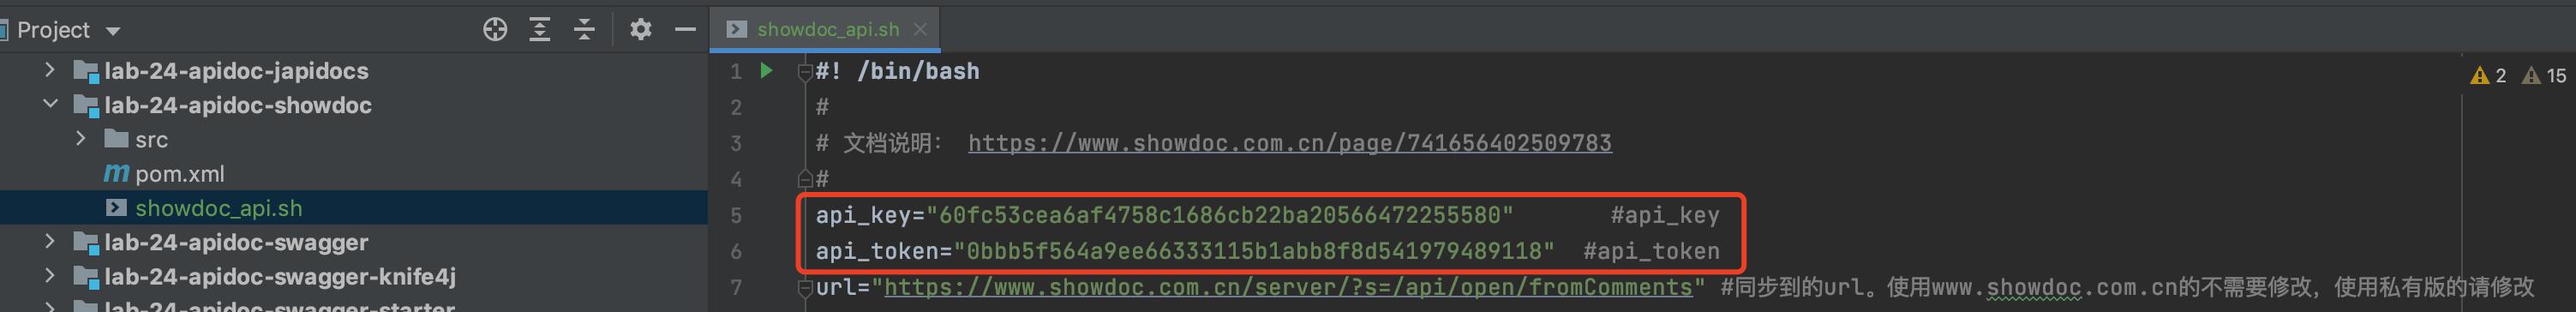 设置 `api_key` 和 `api_token` 秘钥对